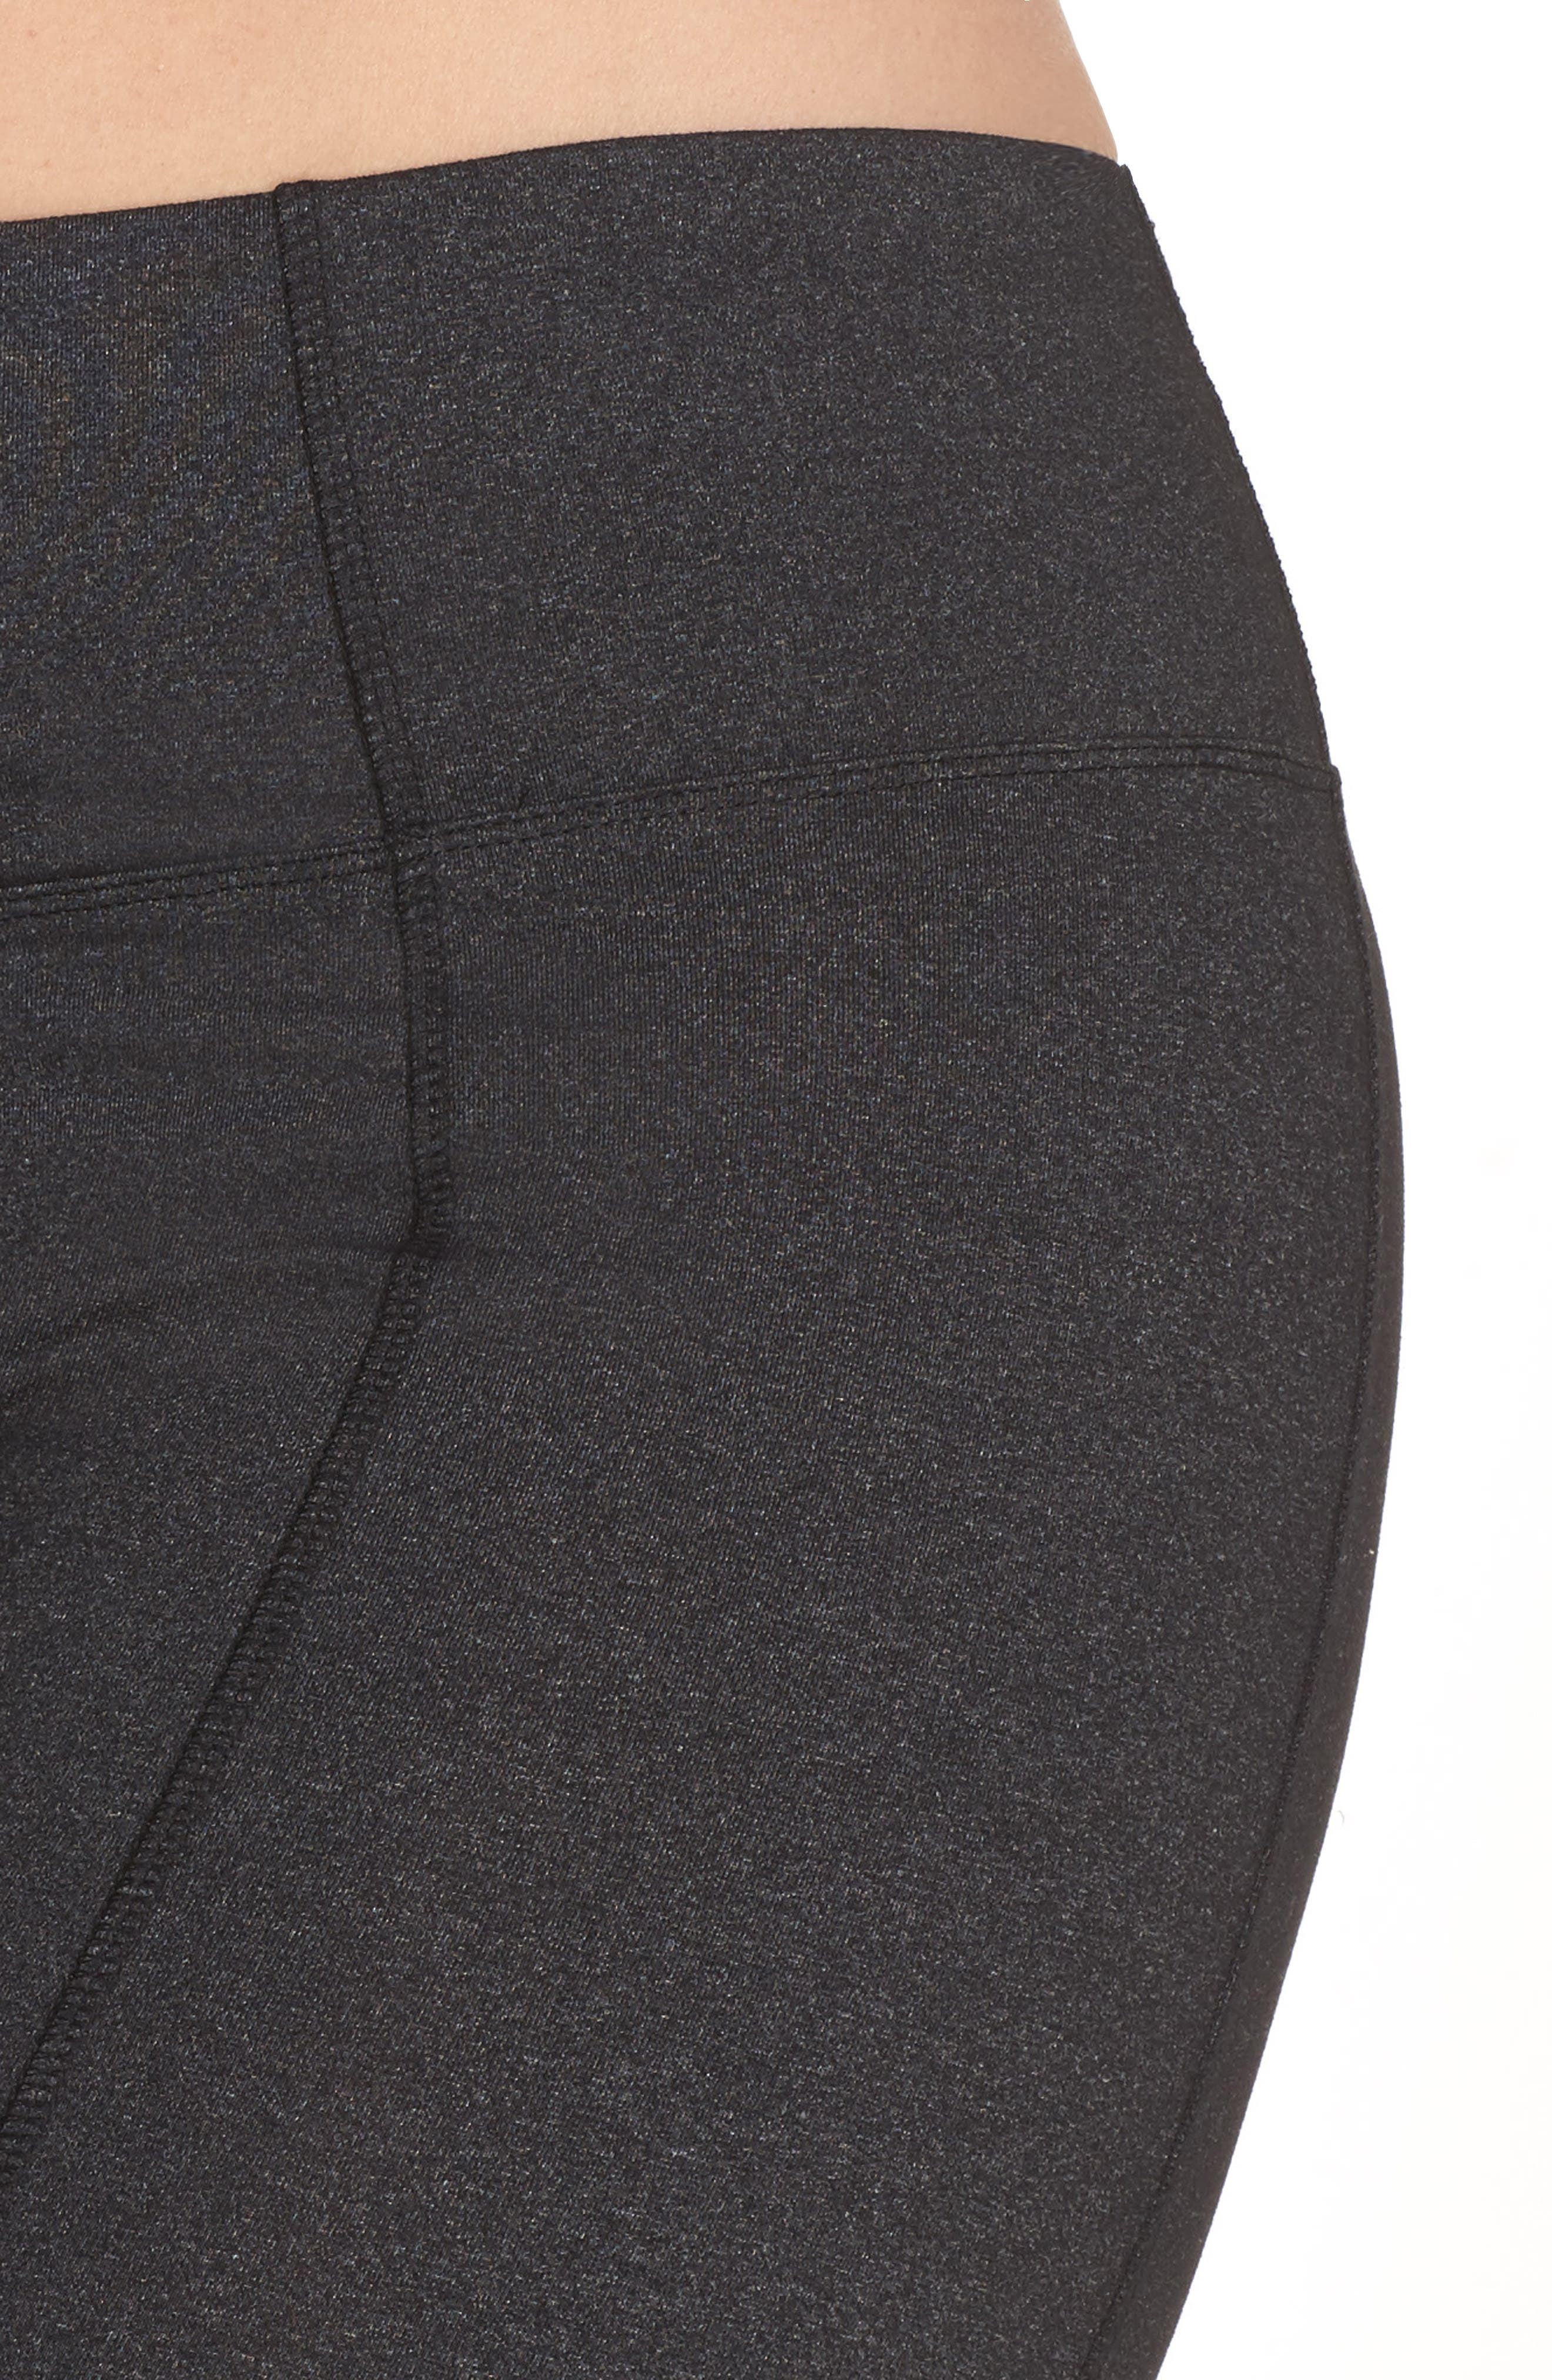 High Rise Control Top Bootcut Pants,                             Alternate thumbnail 4, color,                             003